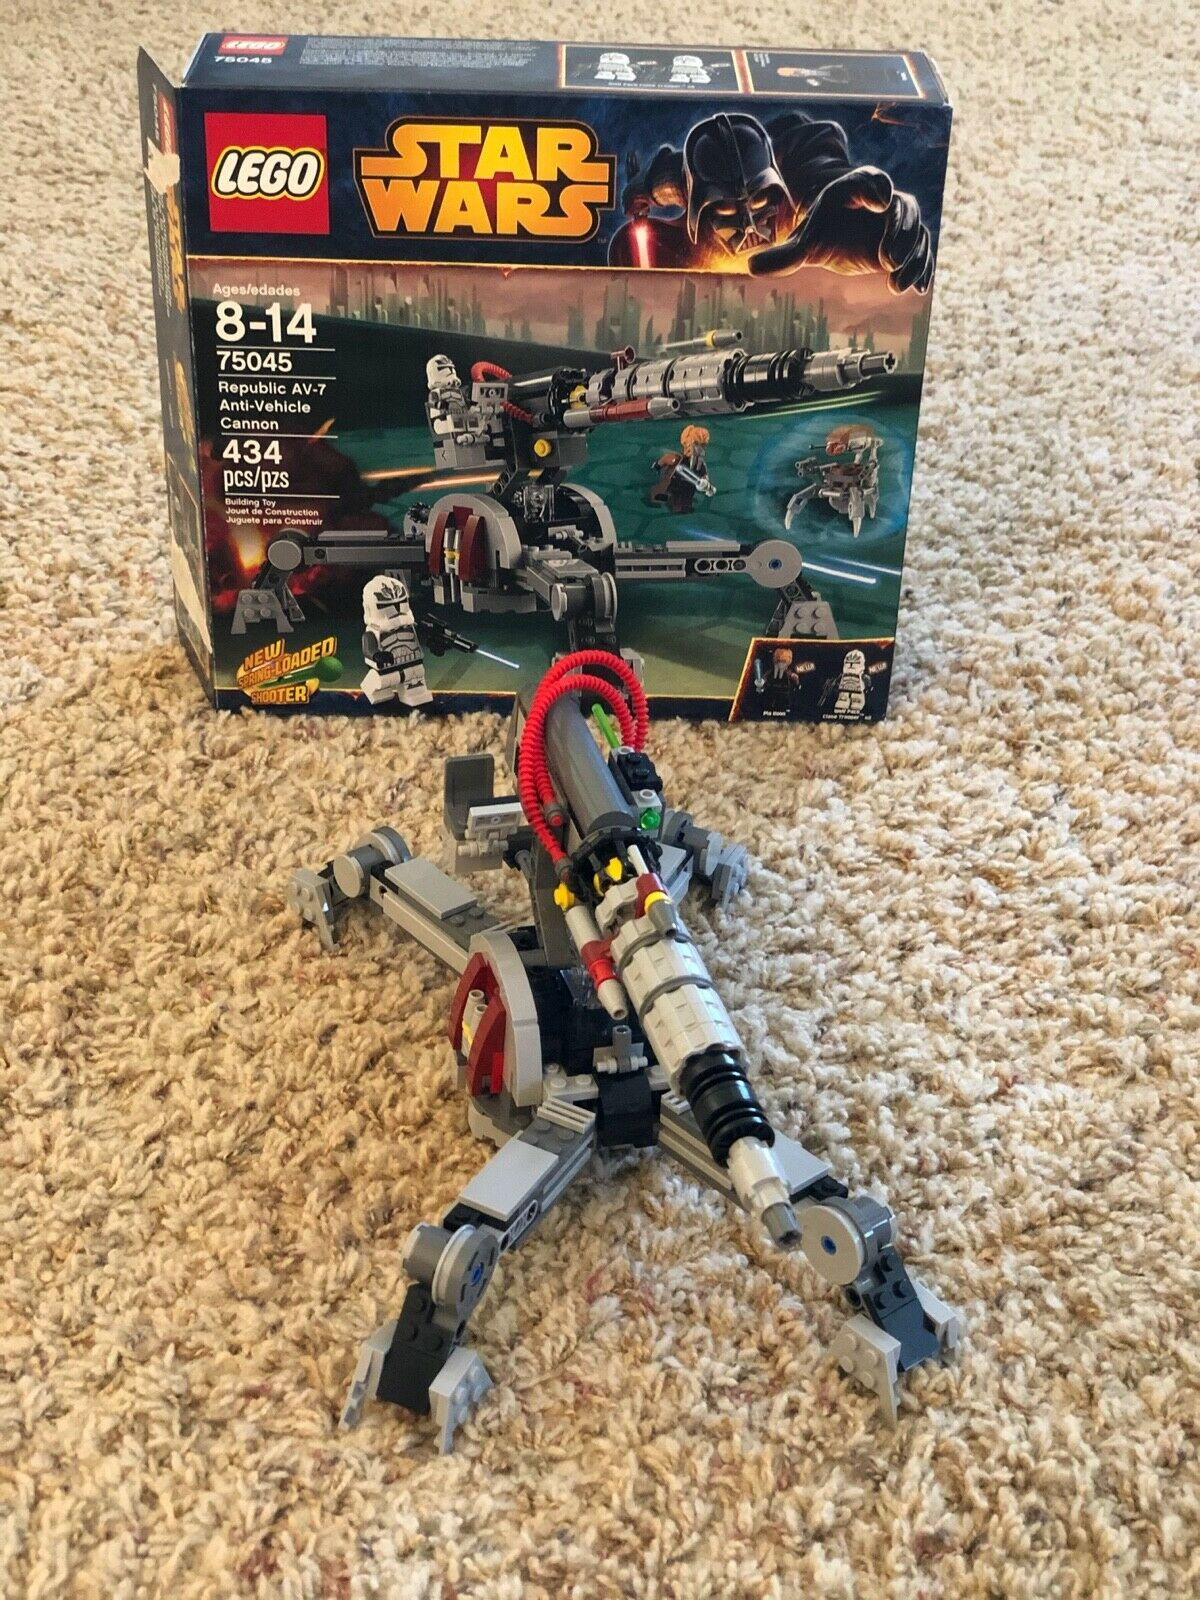 Wolfpack Clone Trooper  ! AV-7 Anti-Vehicle Cannon™  Star  Wars™ Set 75045